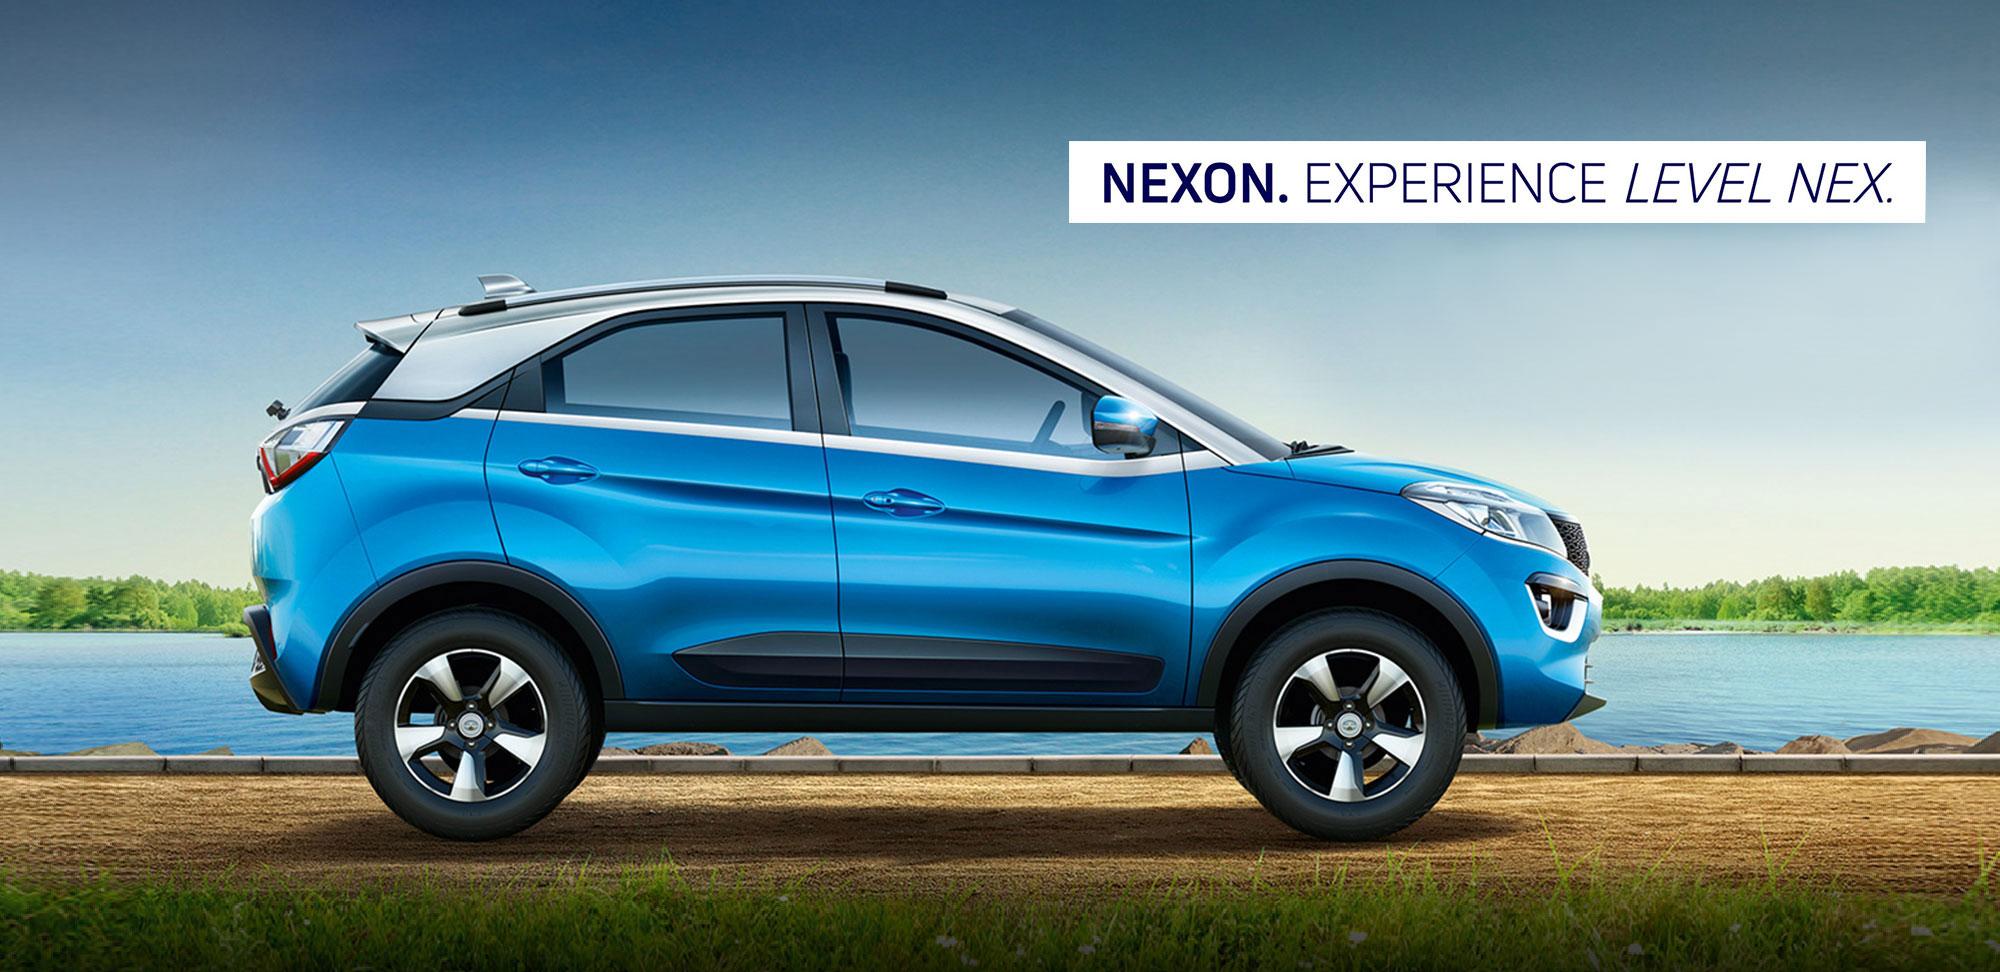 Nexon new